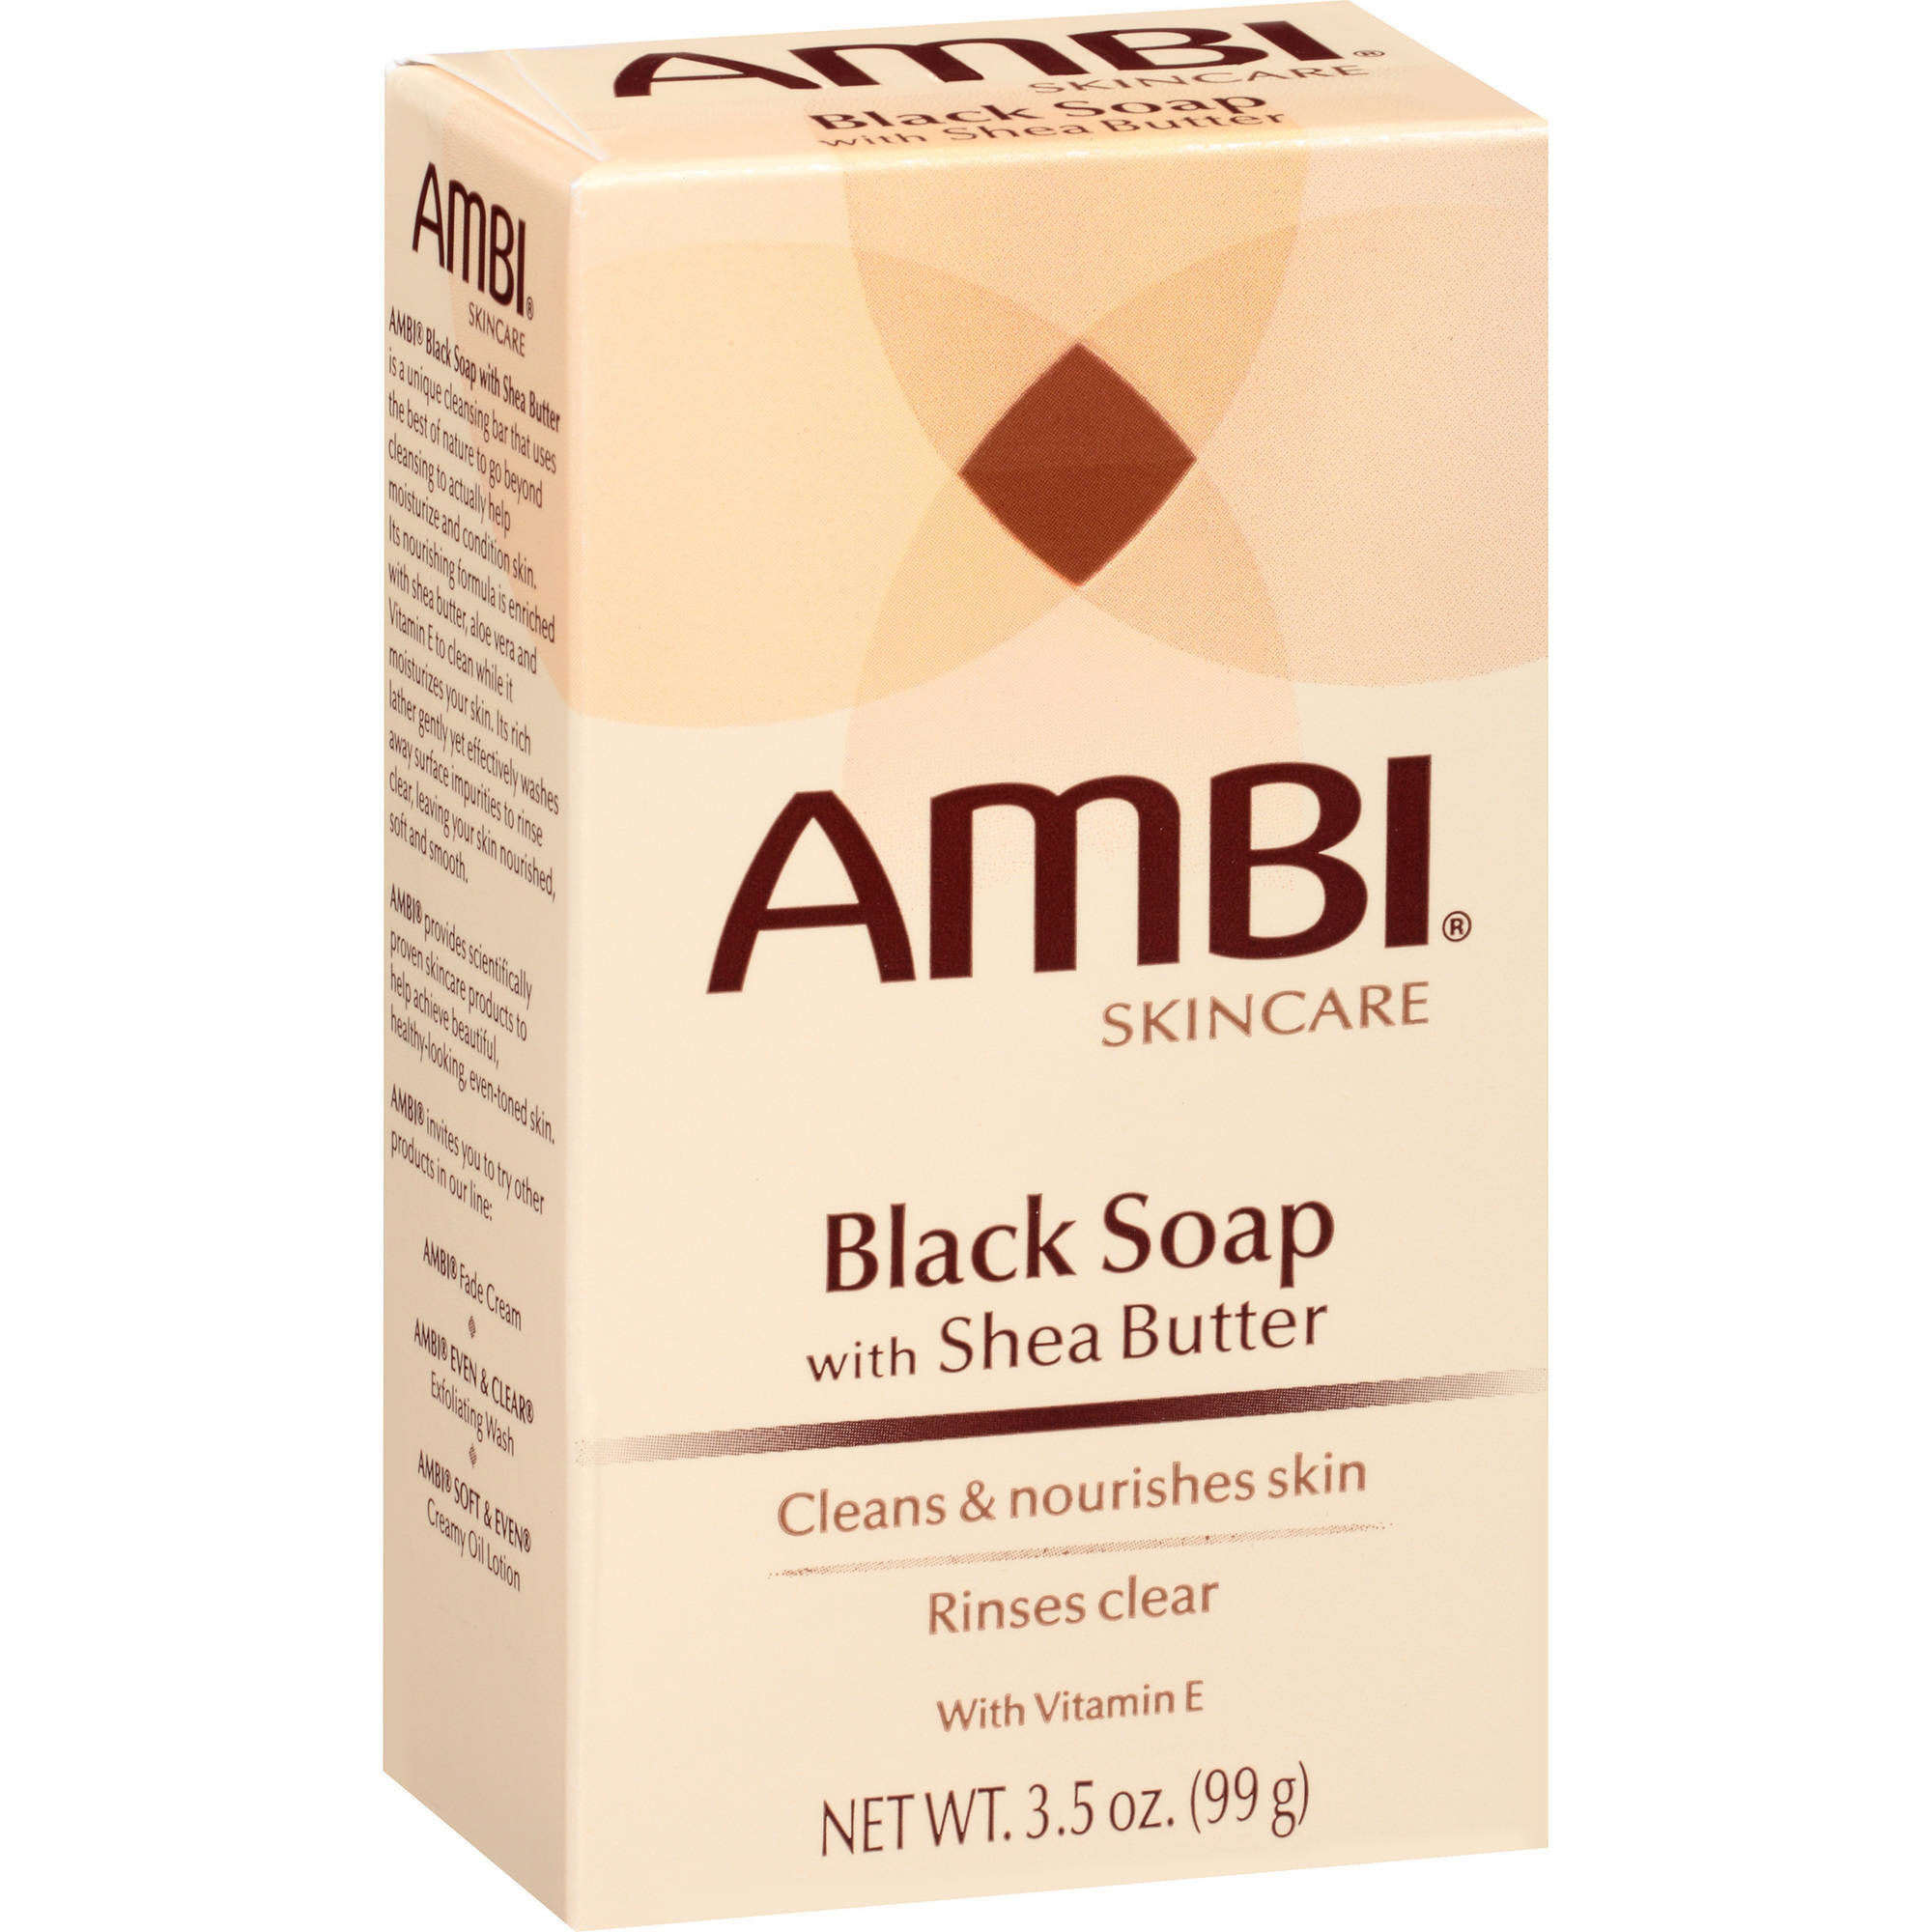 Ambi Skincare Black Soap with Shea Butter, 3.5 oz